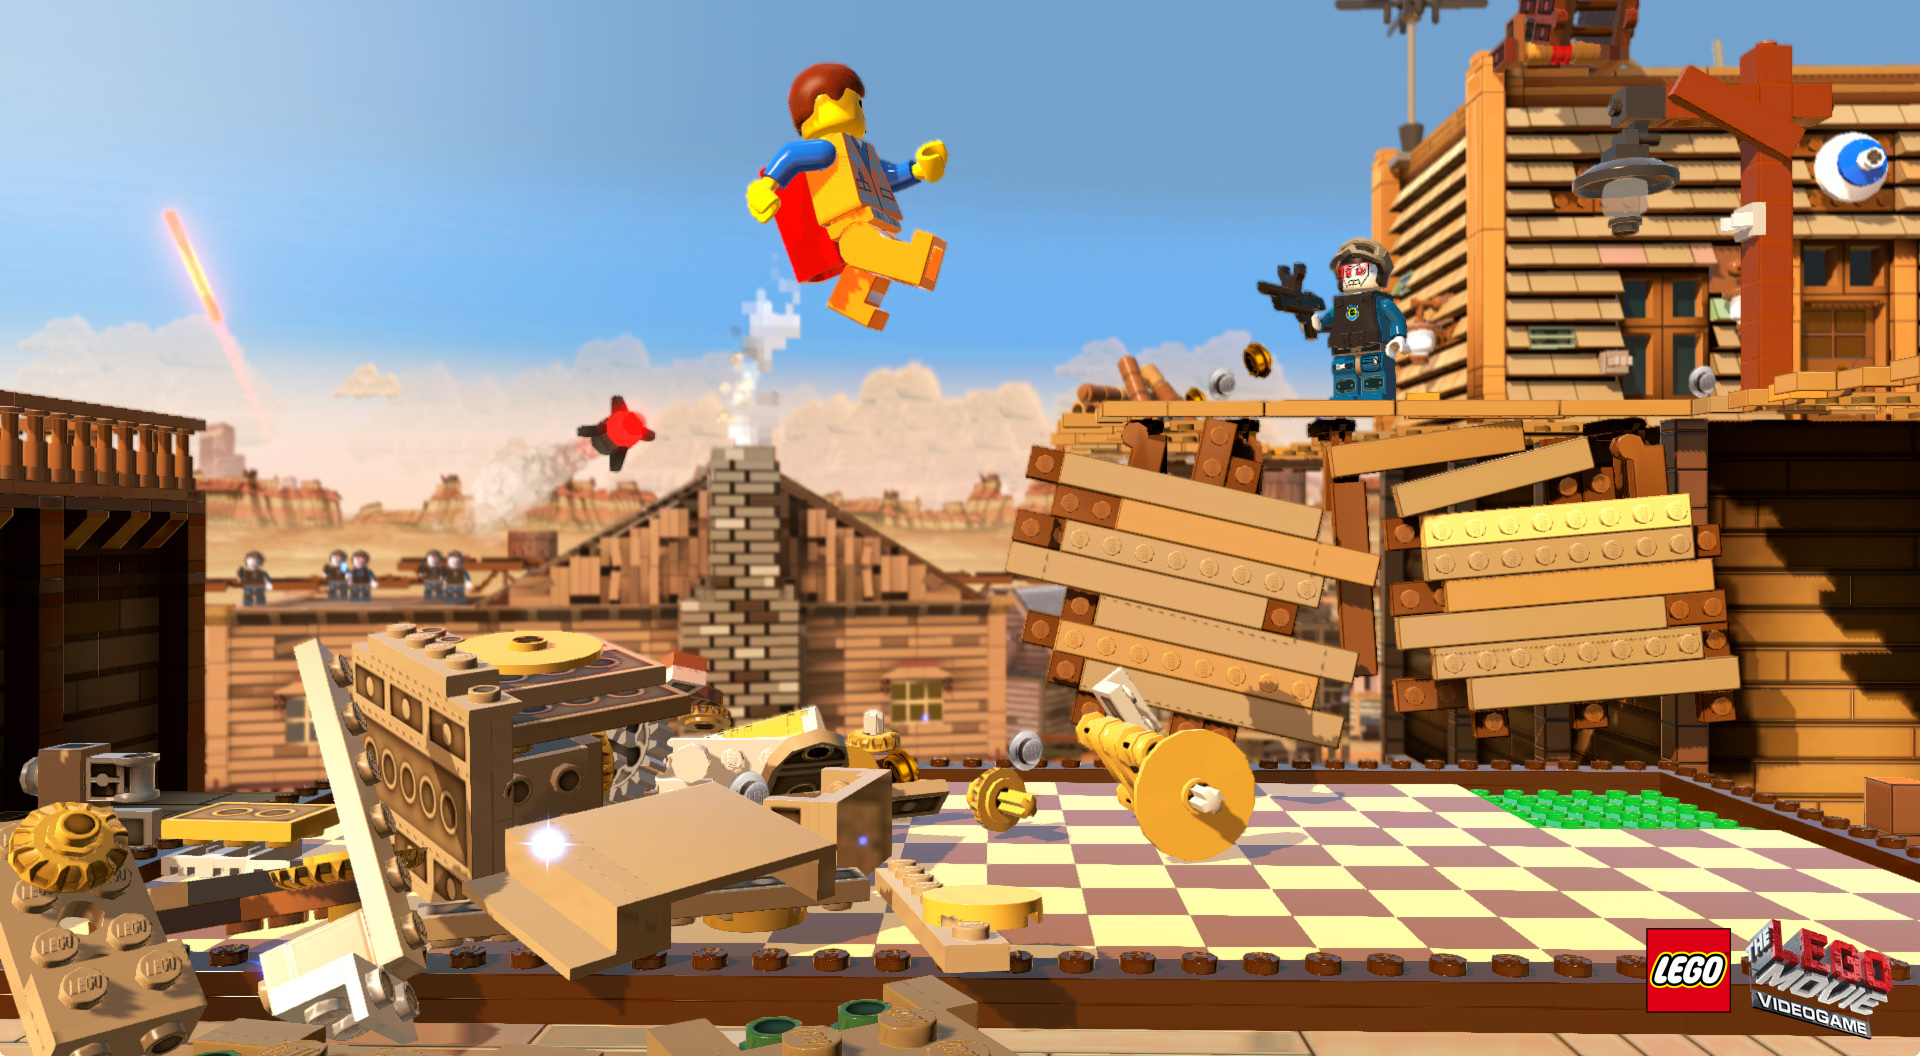 LEGO Movie Videogame 93465